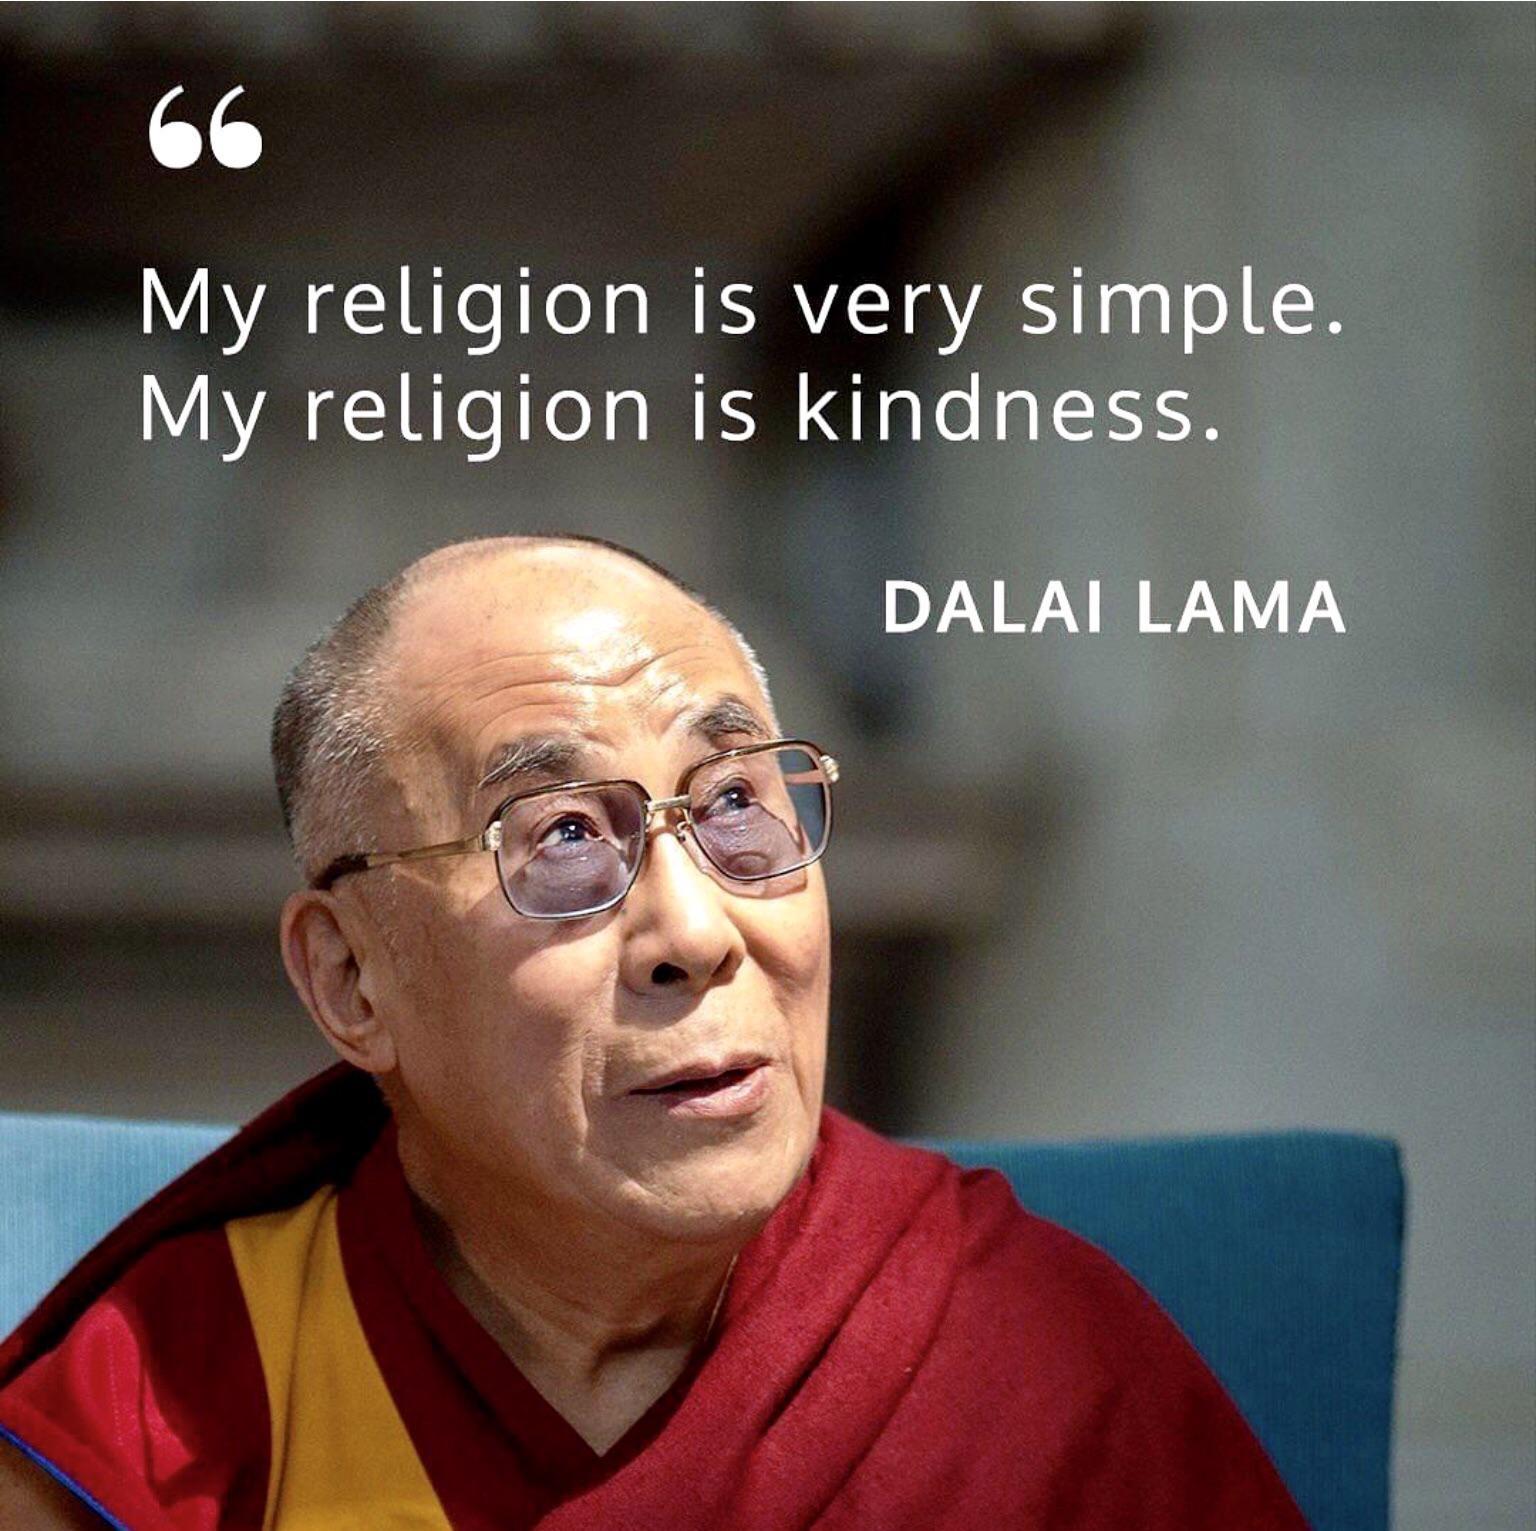 My religion is very simple. ~Dalai Lama [1536 X 1531]